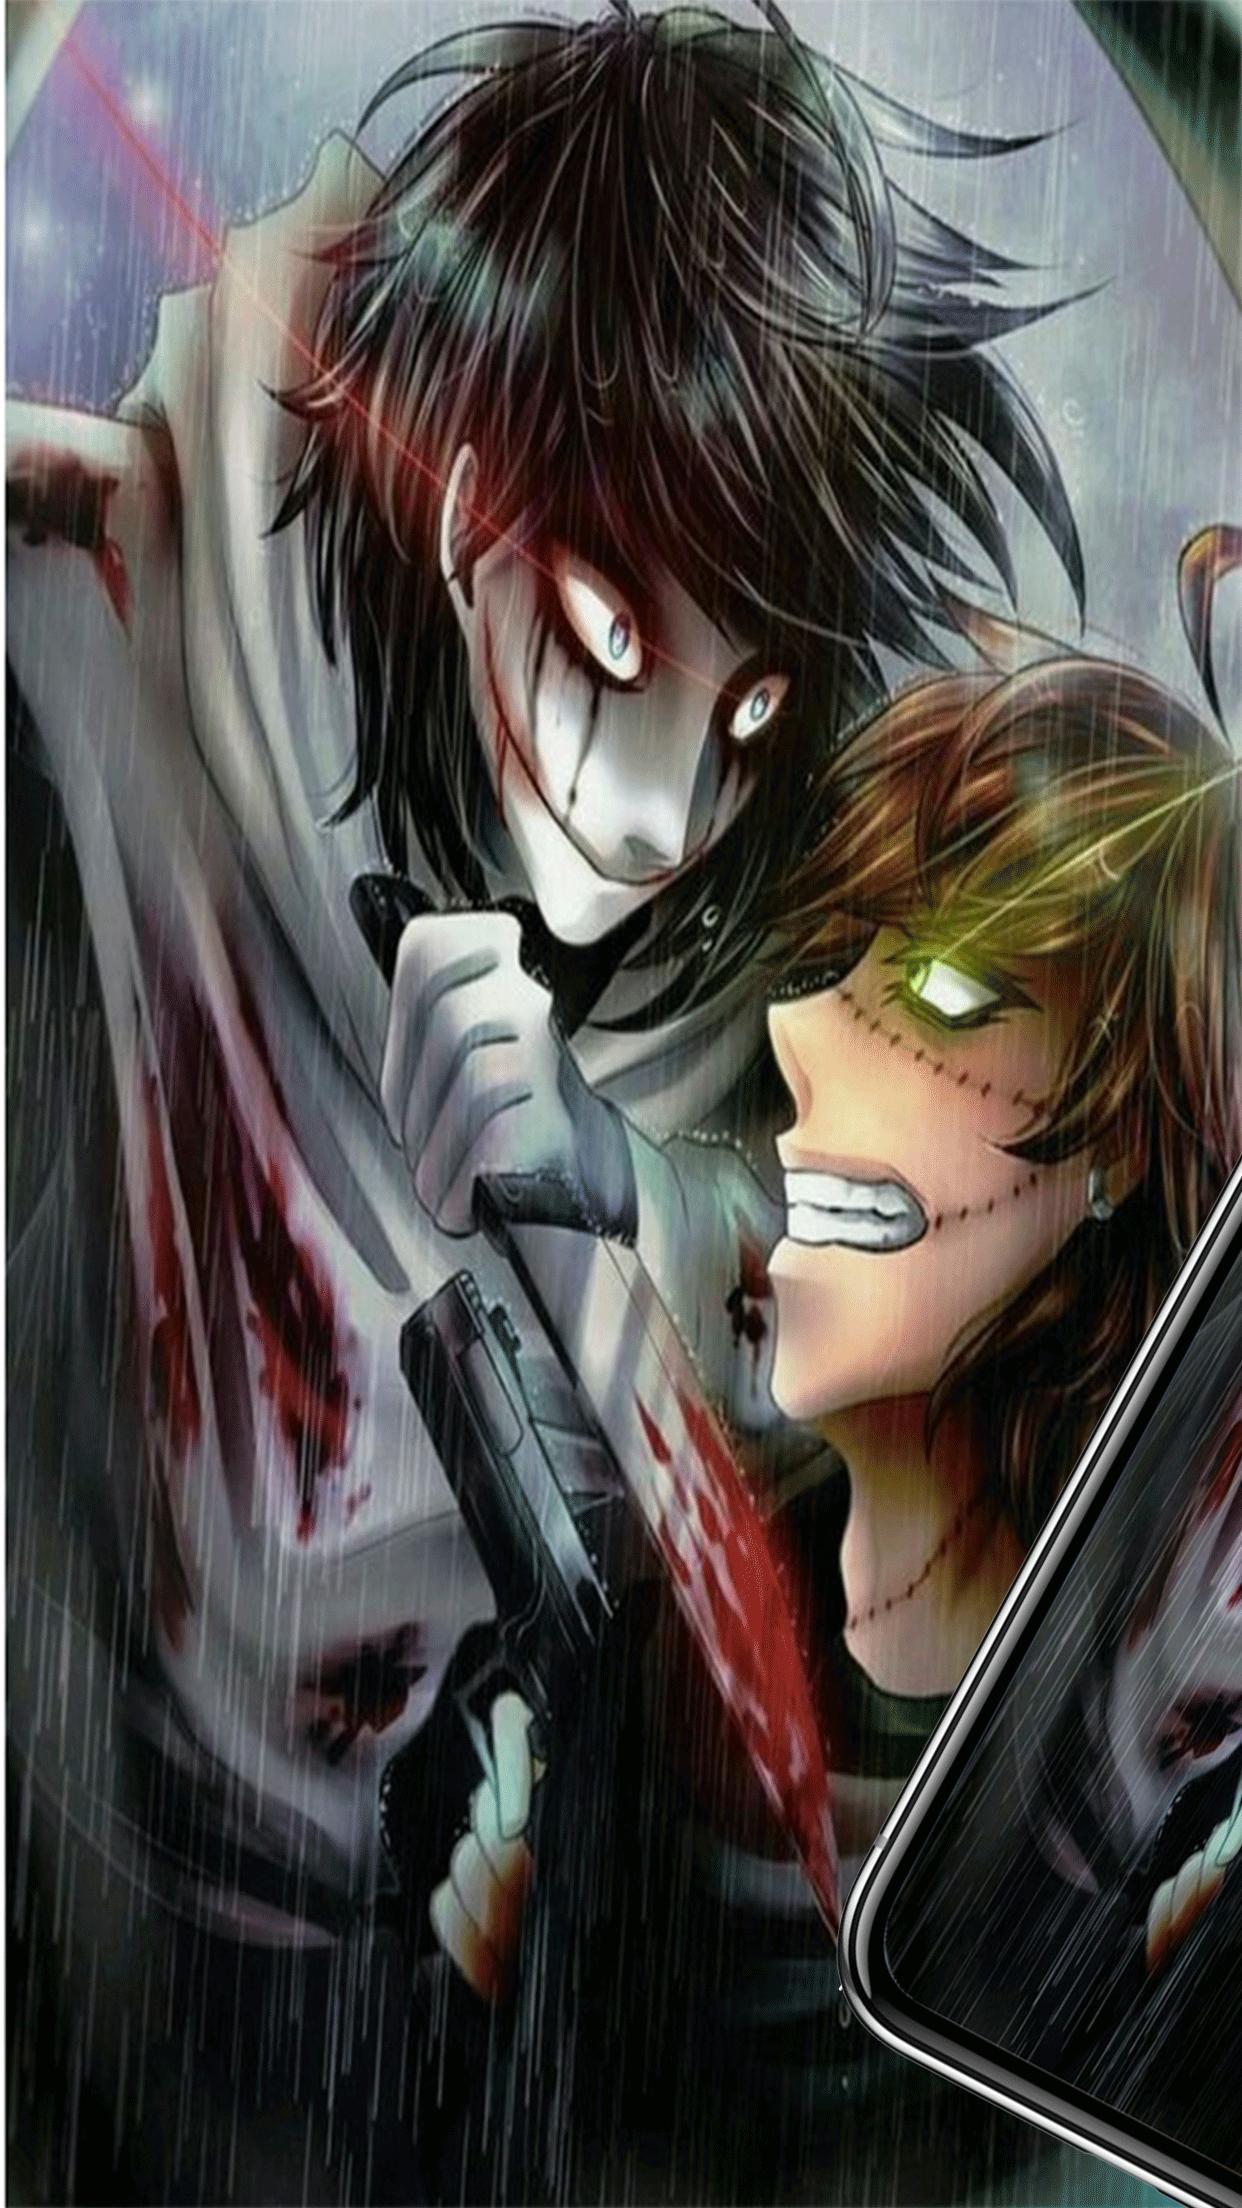 Creepypasta Jeff The Killer Anime Posted By Samantha Tremblay